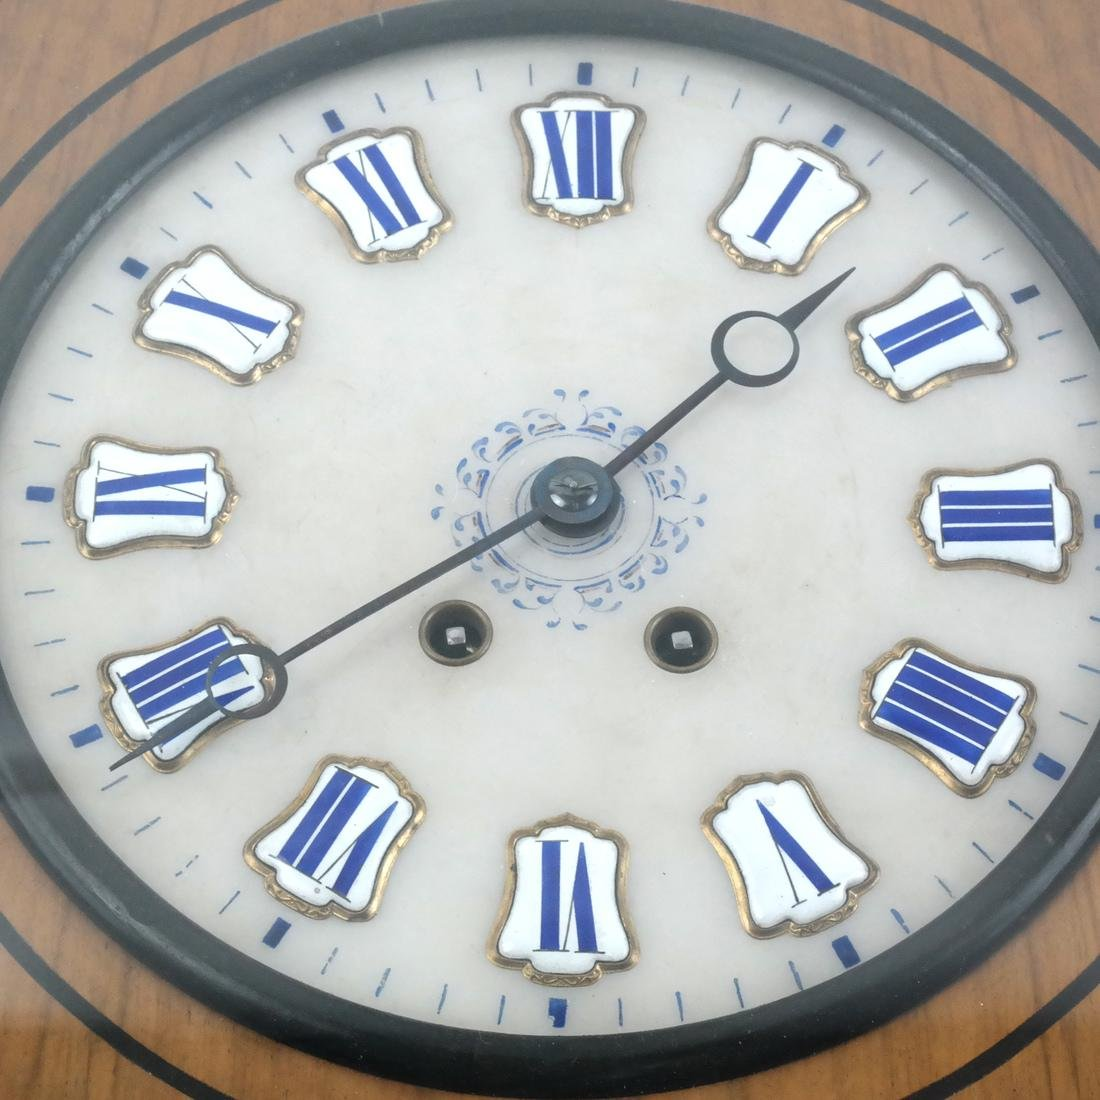 Biedermeier-Style Oval Regulator Clock - 2